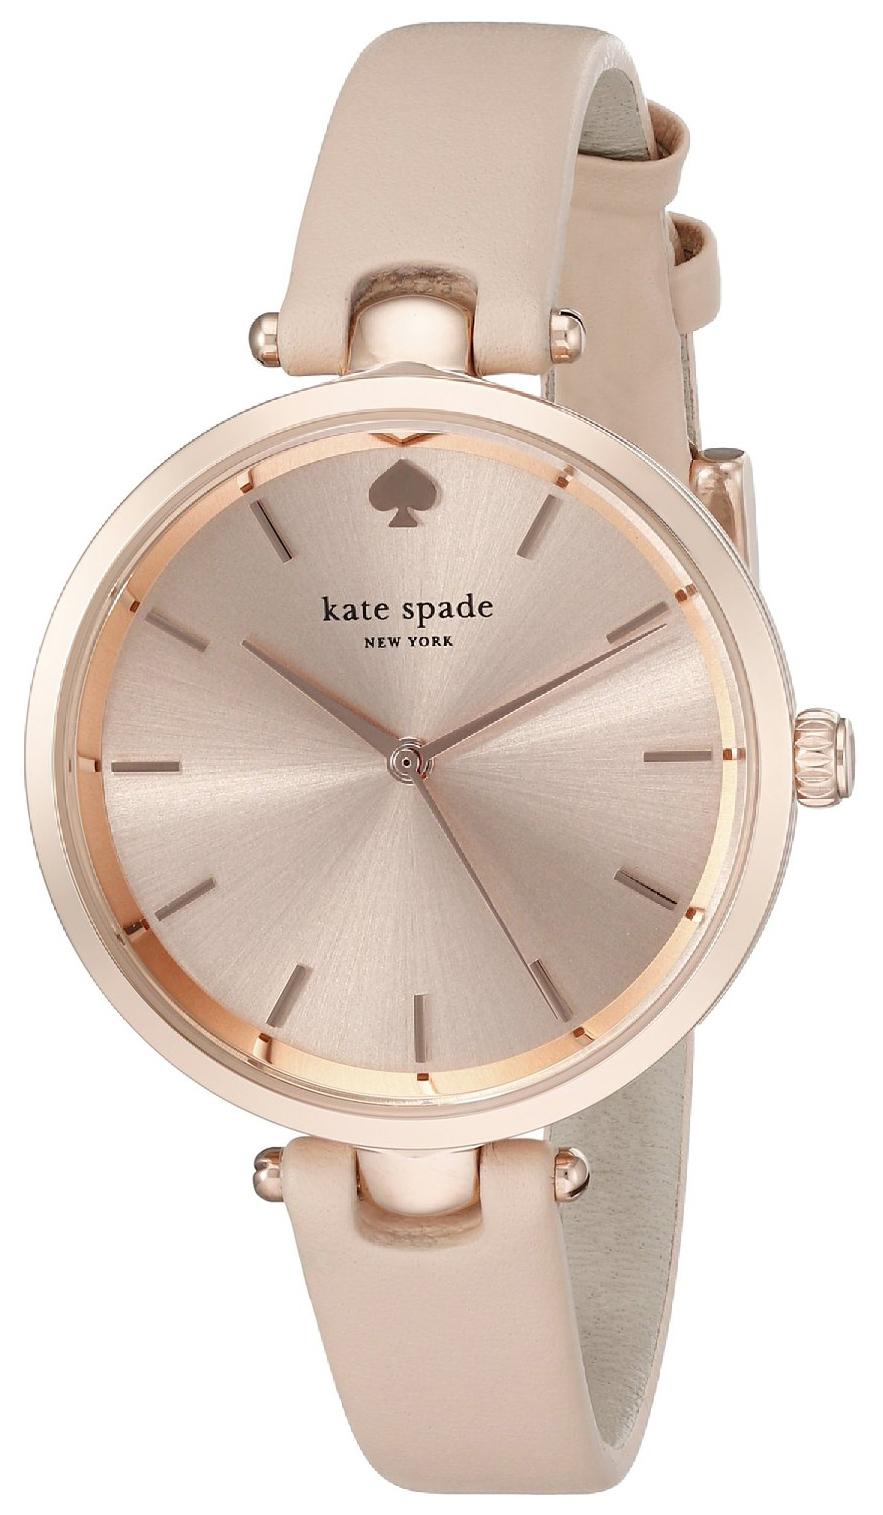 Kate Spade 99999 Dameklokke 1YRU0812 Rosegullfarget/Lær Ø34 mm - Kate Spade